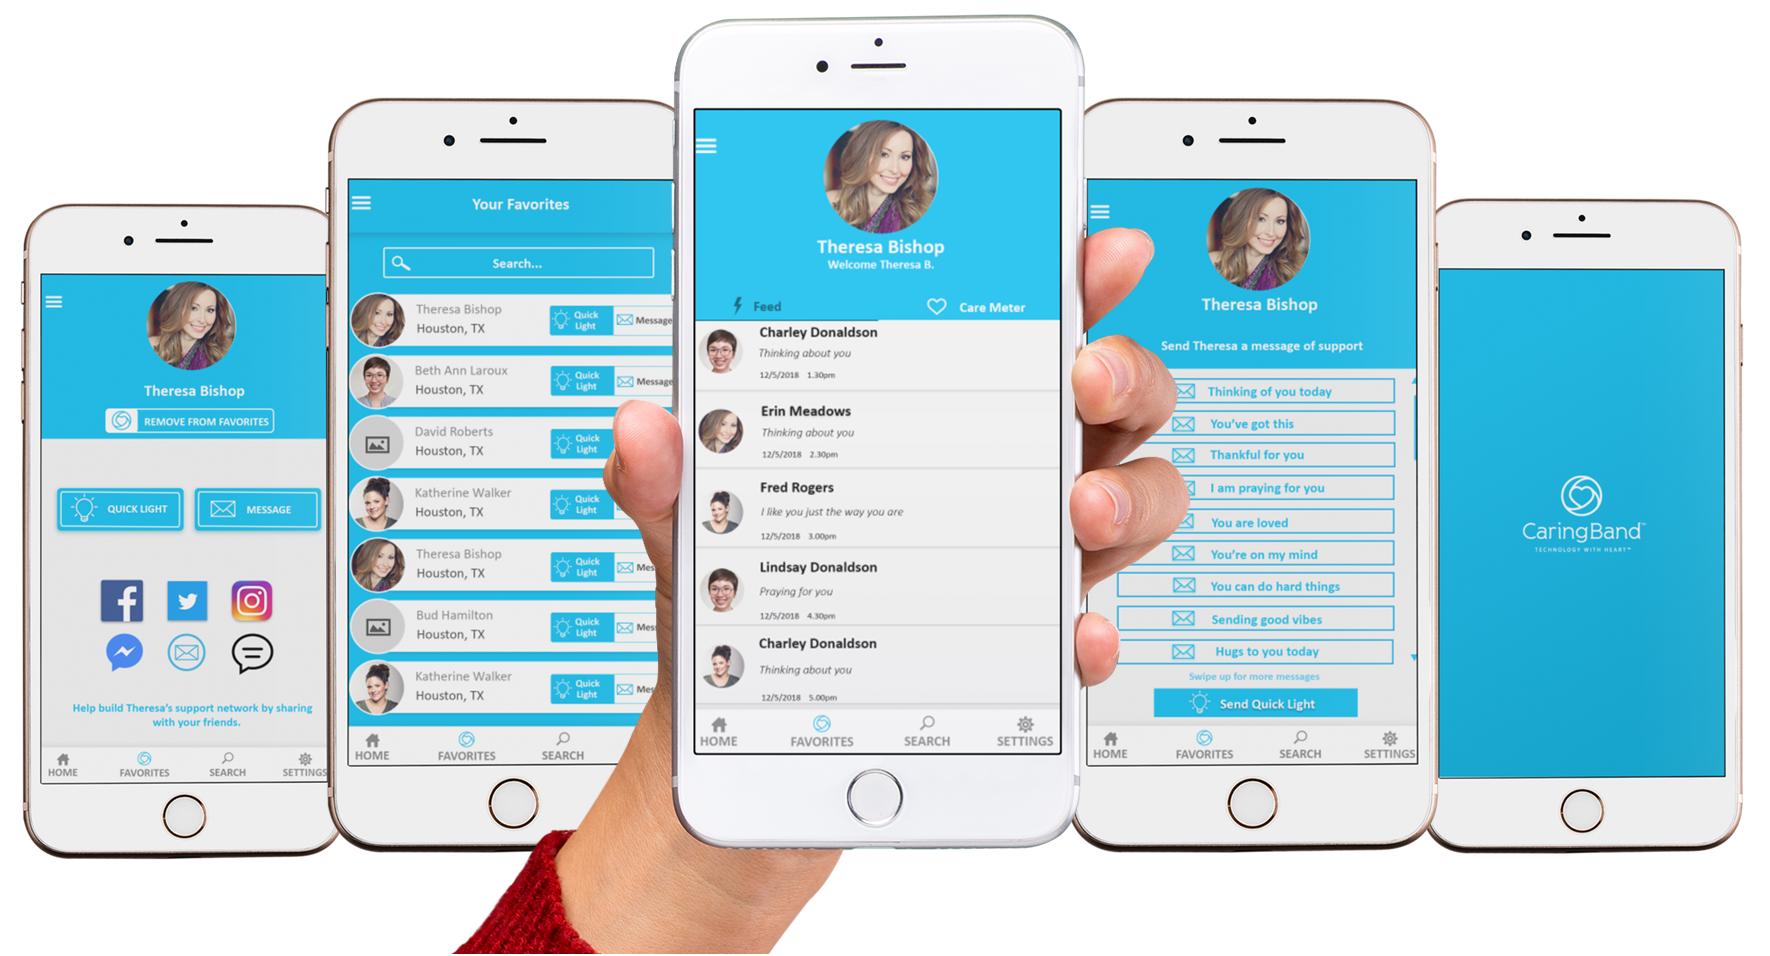 CaringBand App on Cell Phone